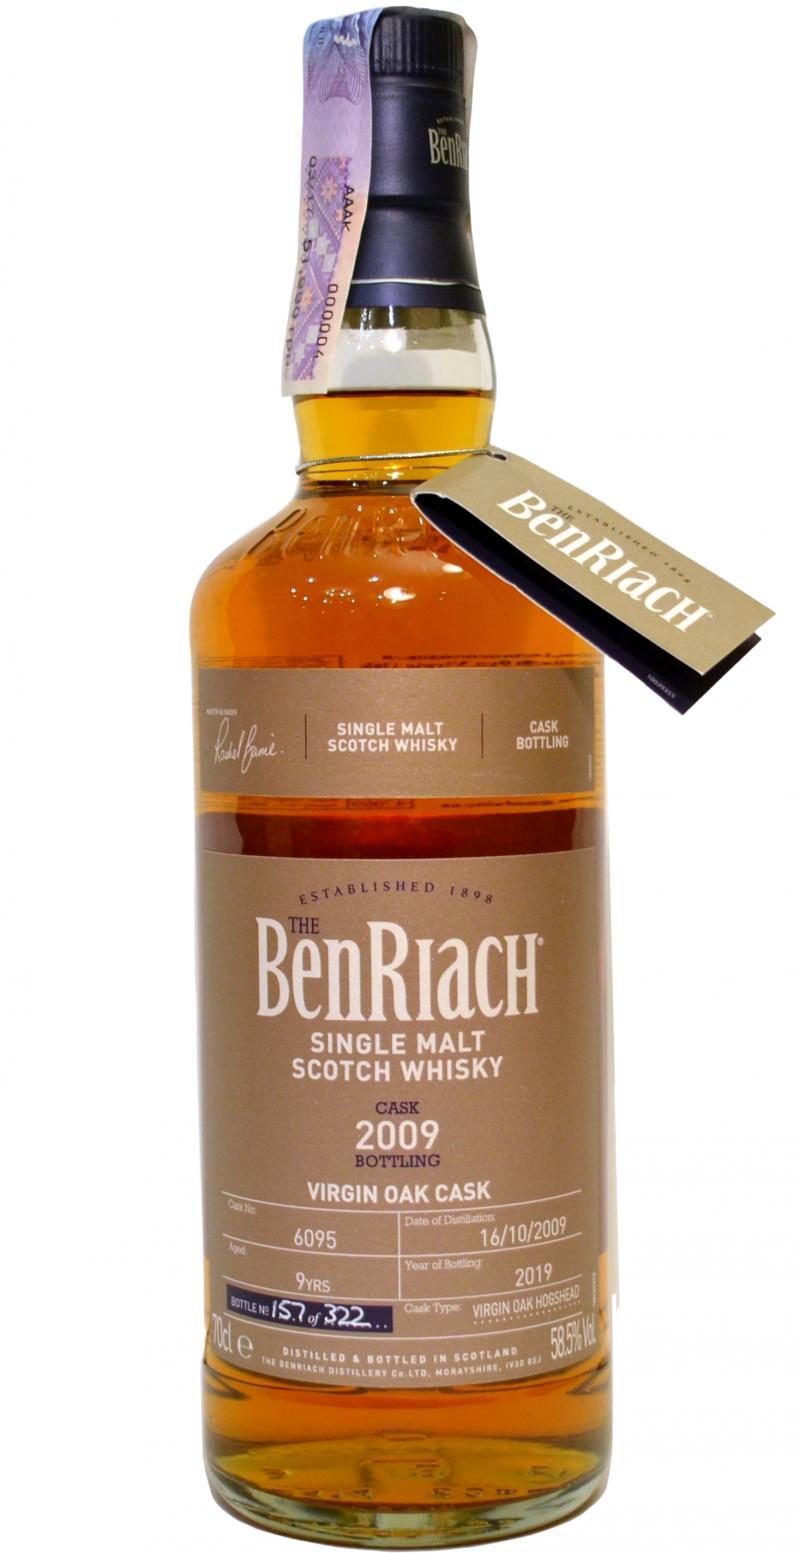 BenRiach 2009